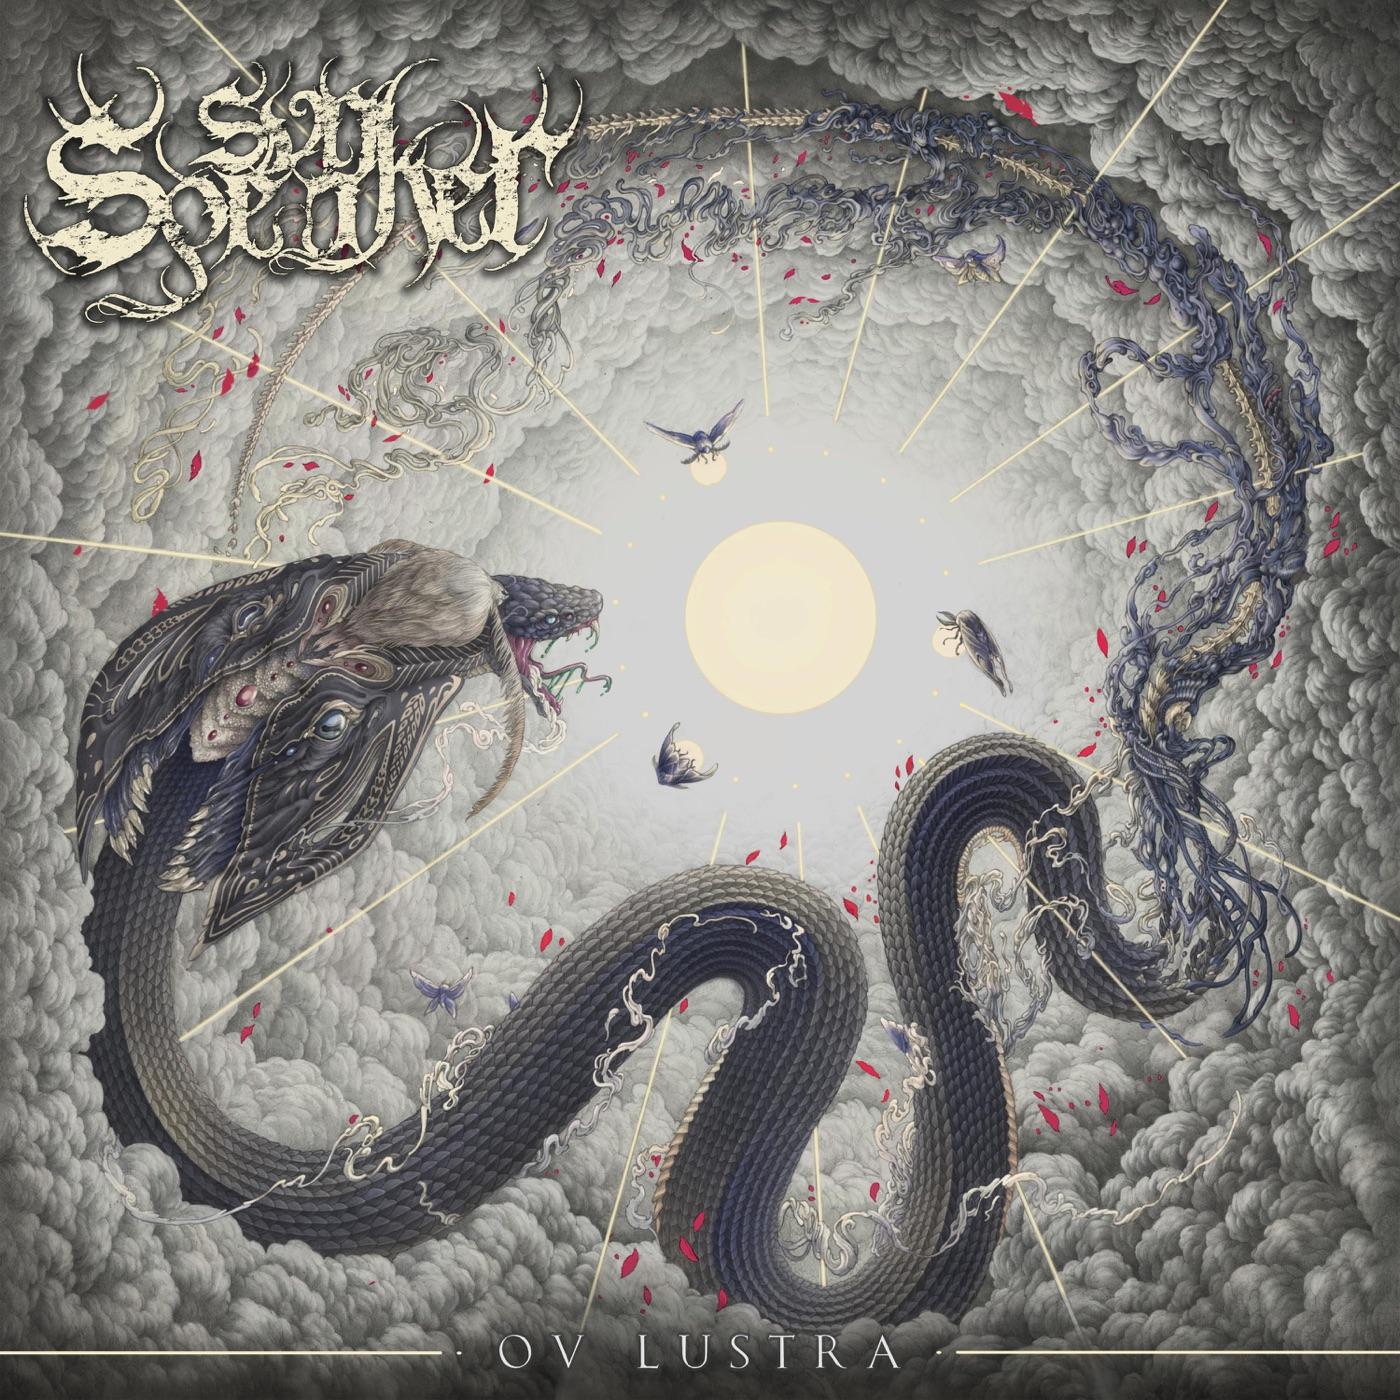 Sun Speaker - Ov Lustra (2018)